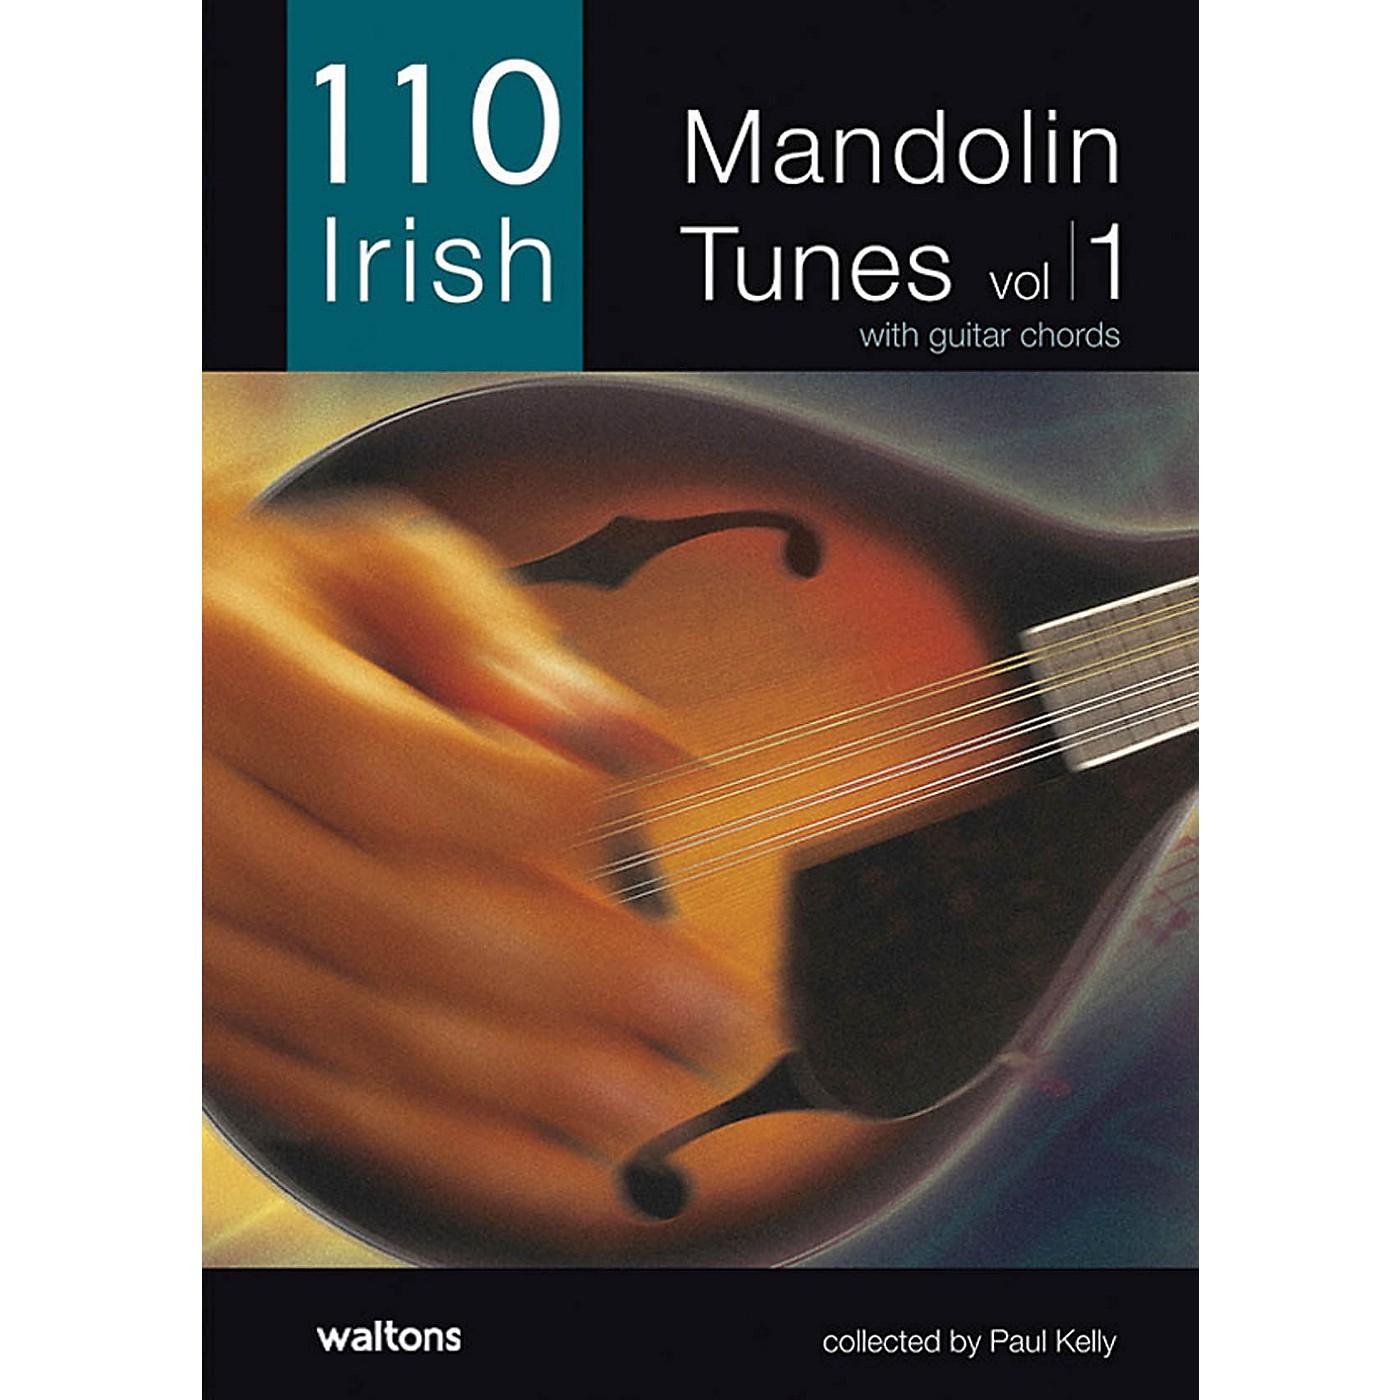 Waltons 110 Irish Mandolin Tunes (with Guitar Chords) Waltons Irish Music Books Series thumbnail